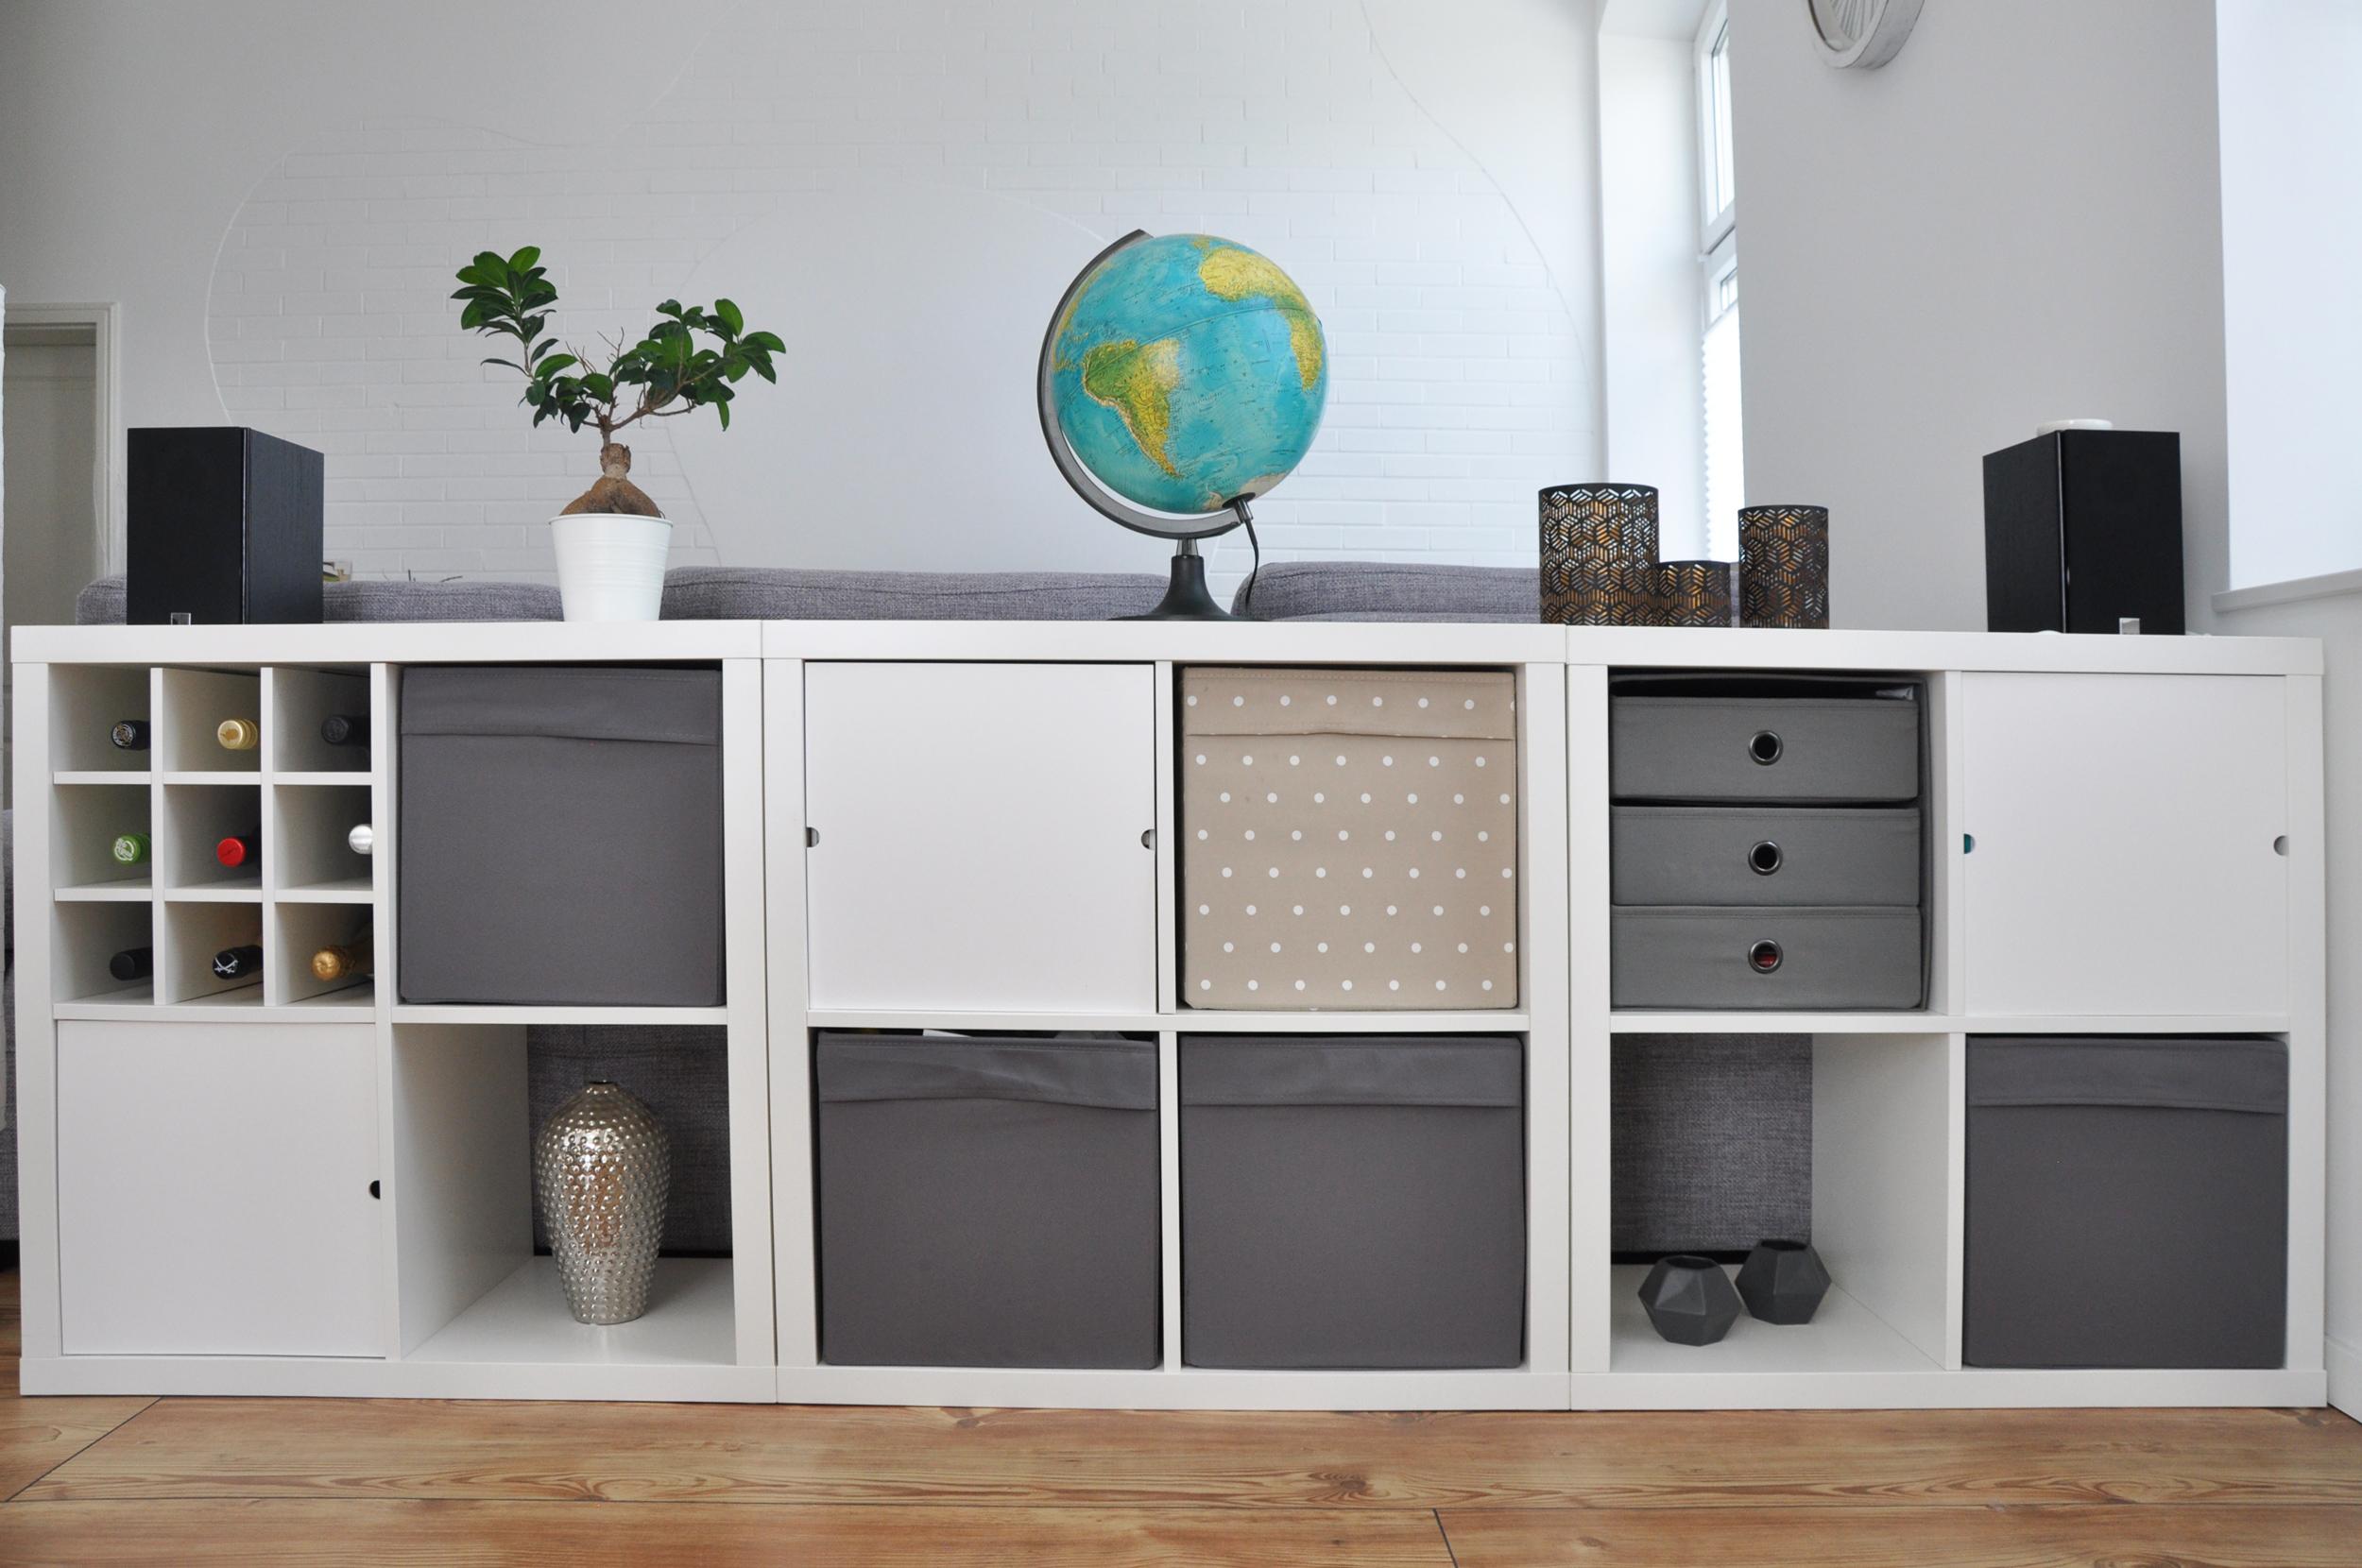 Clutter Cover Im Test Endlich Ordnung Fur Das Ikea Kallax Regal